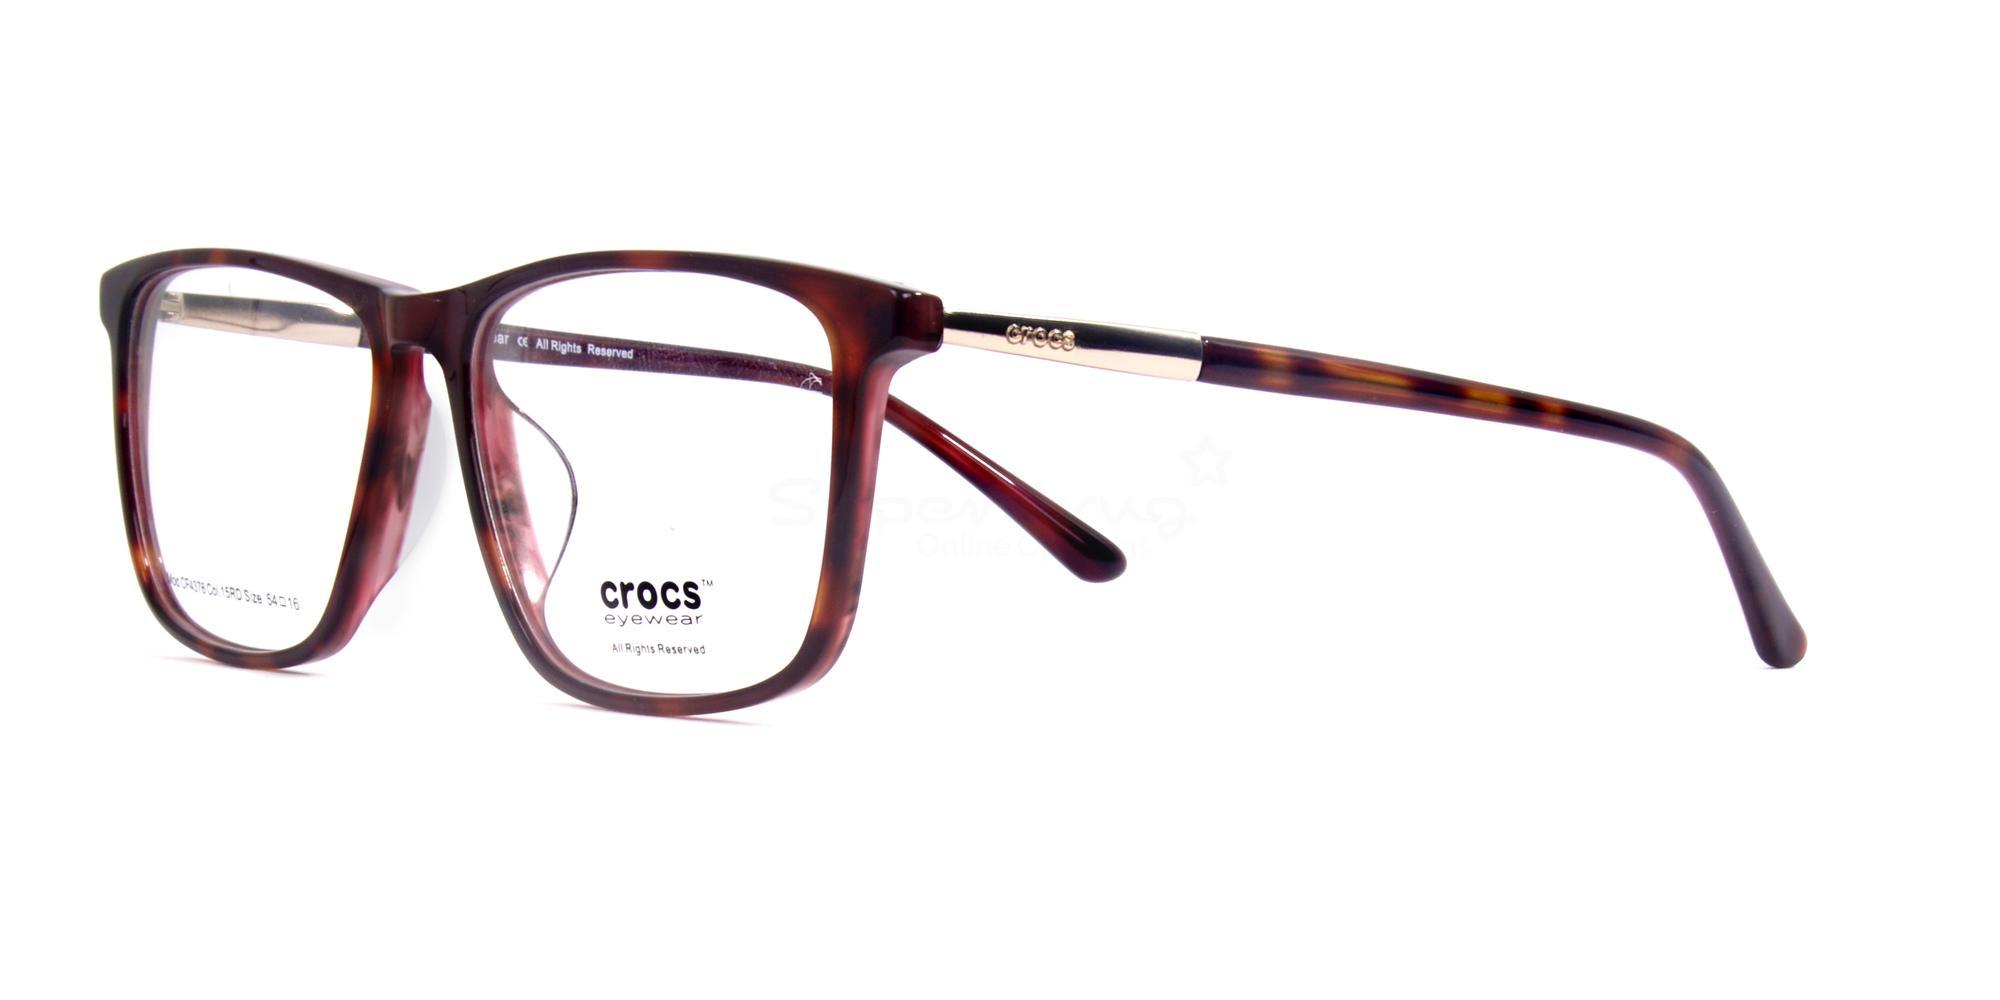 15RD CF4376 Glasses, Crocs Eyewear